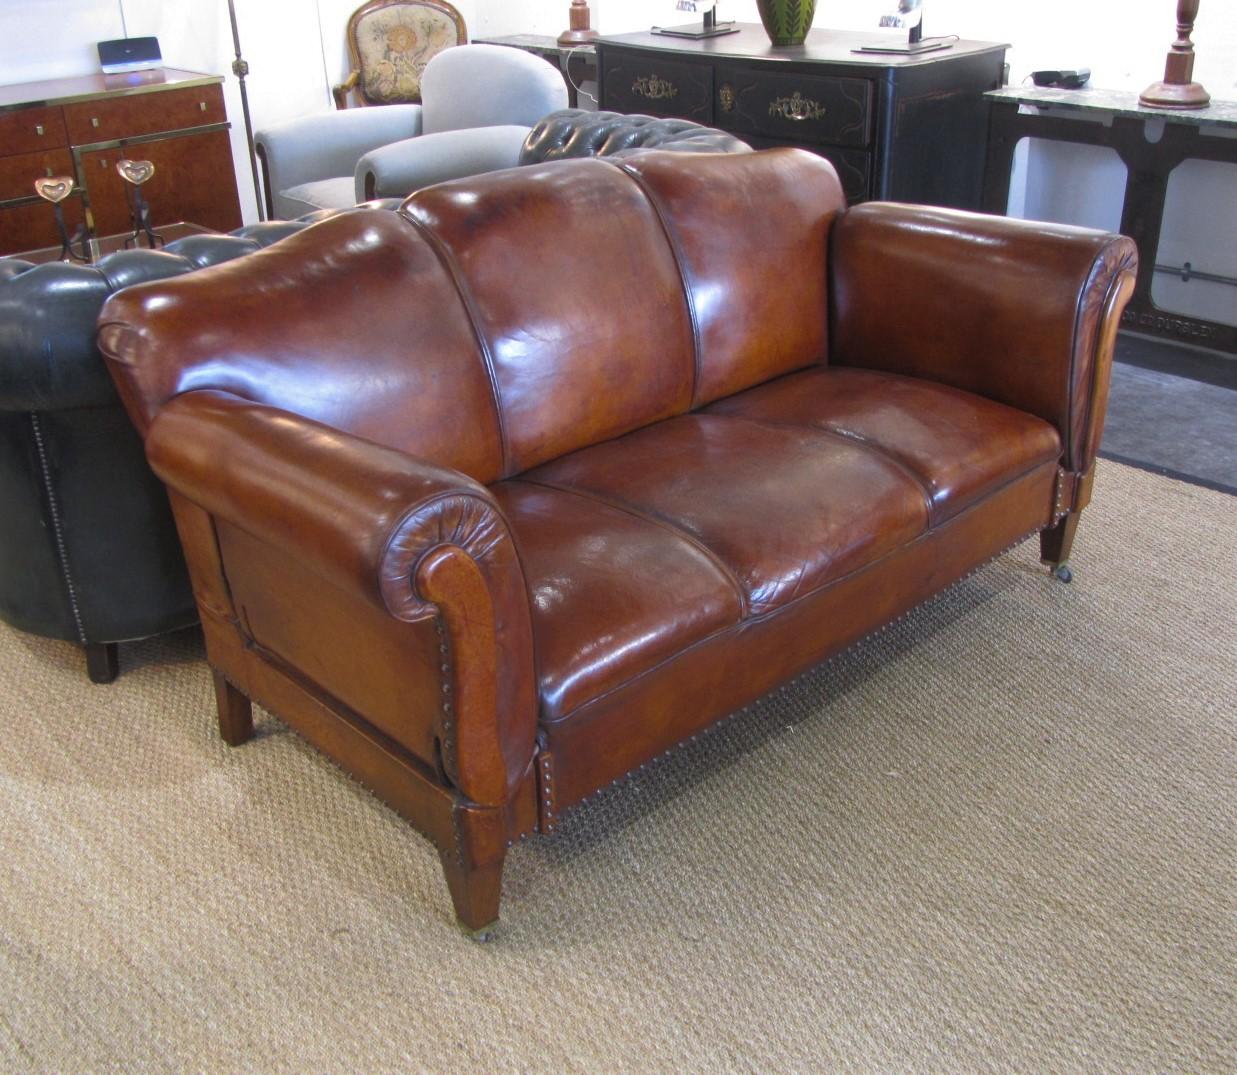 Antique Drop Arm Sofa: A Swedish Double Drop Arm Club Leather Sofa